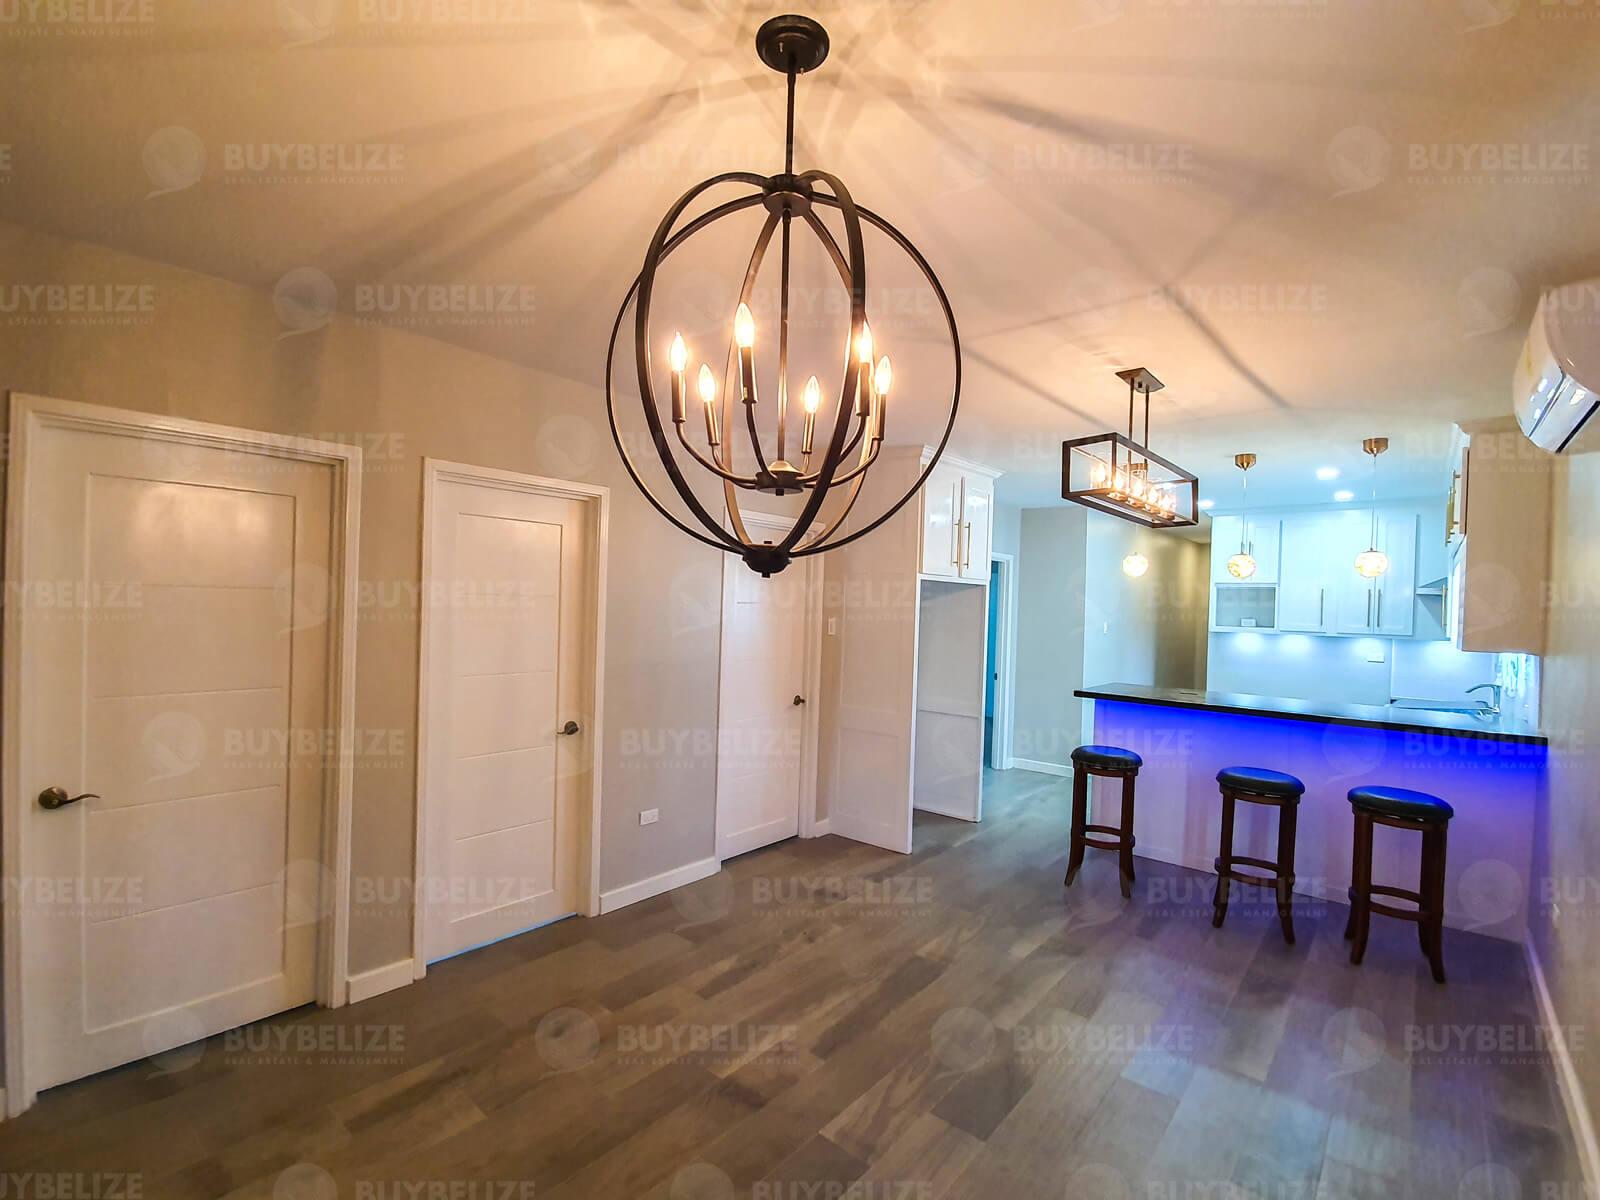 3 Bedroom 2 Bathroom House for Rent in Belize City